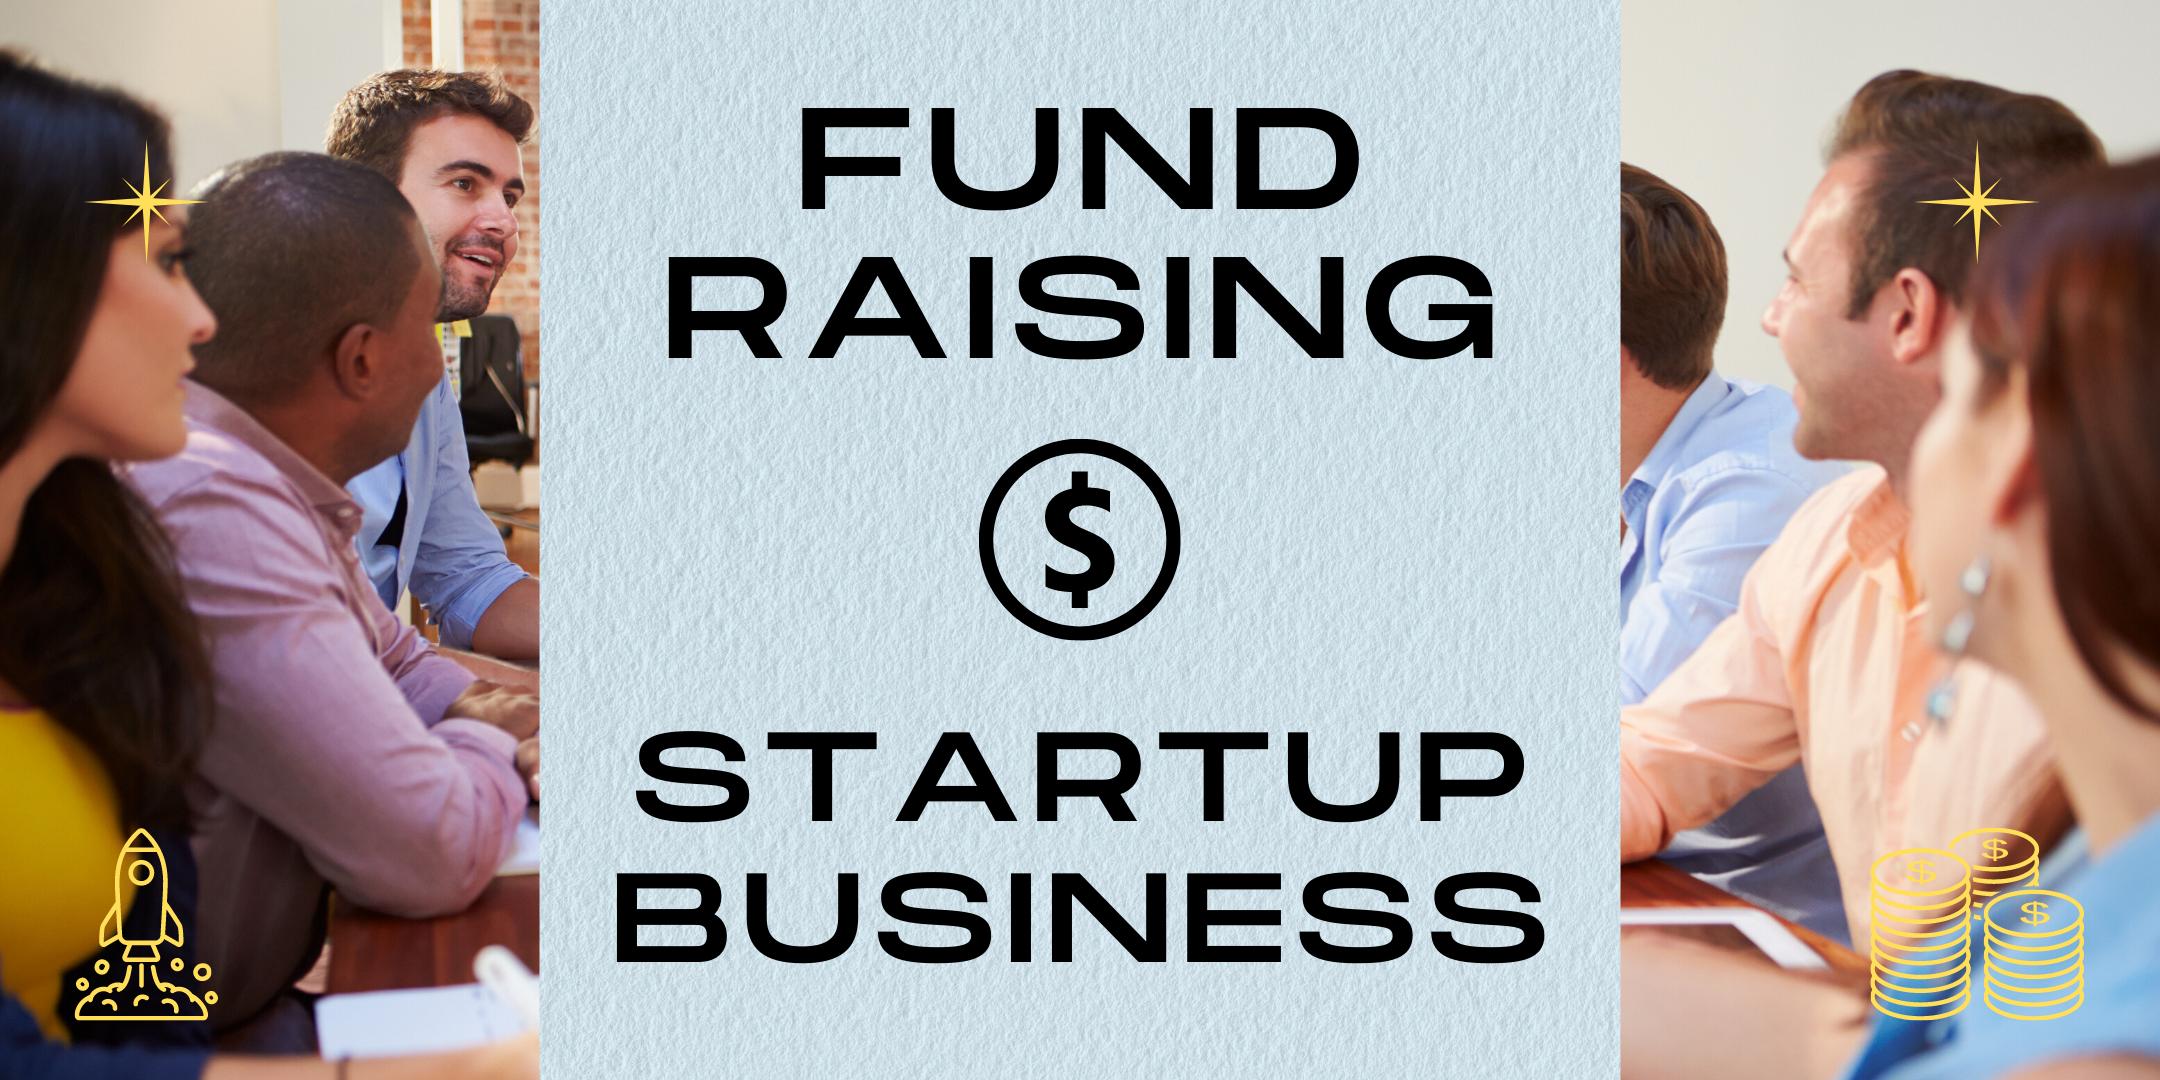 [Startups] : Fund Raising for Startup Business